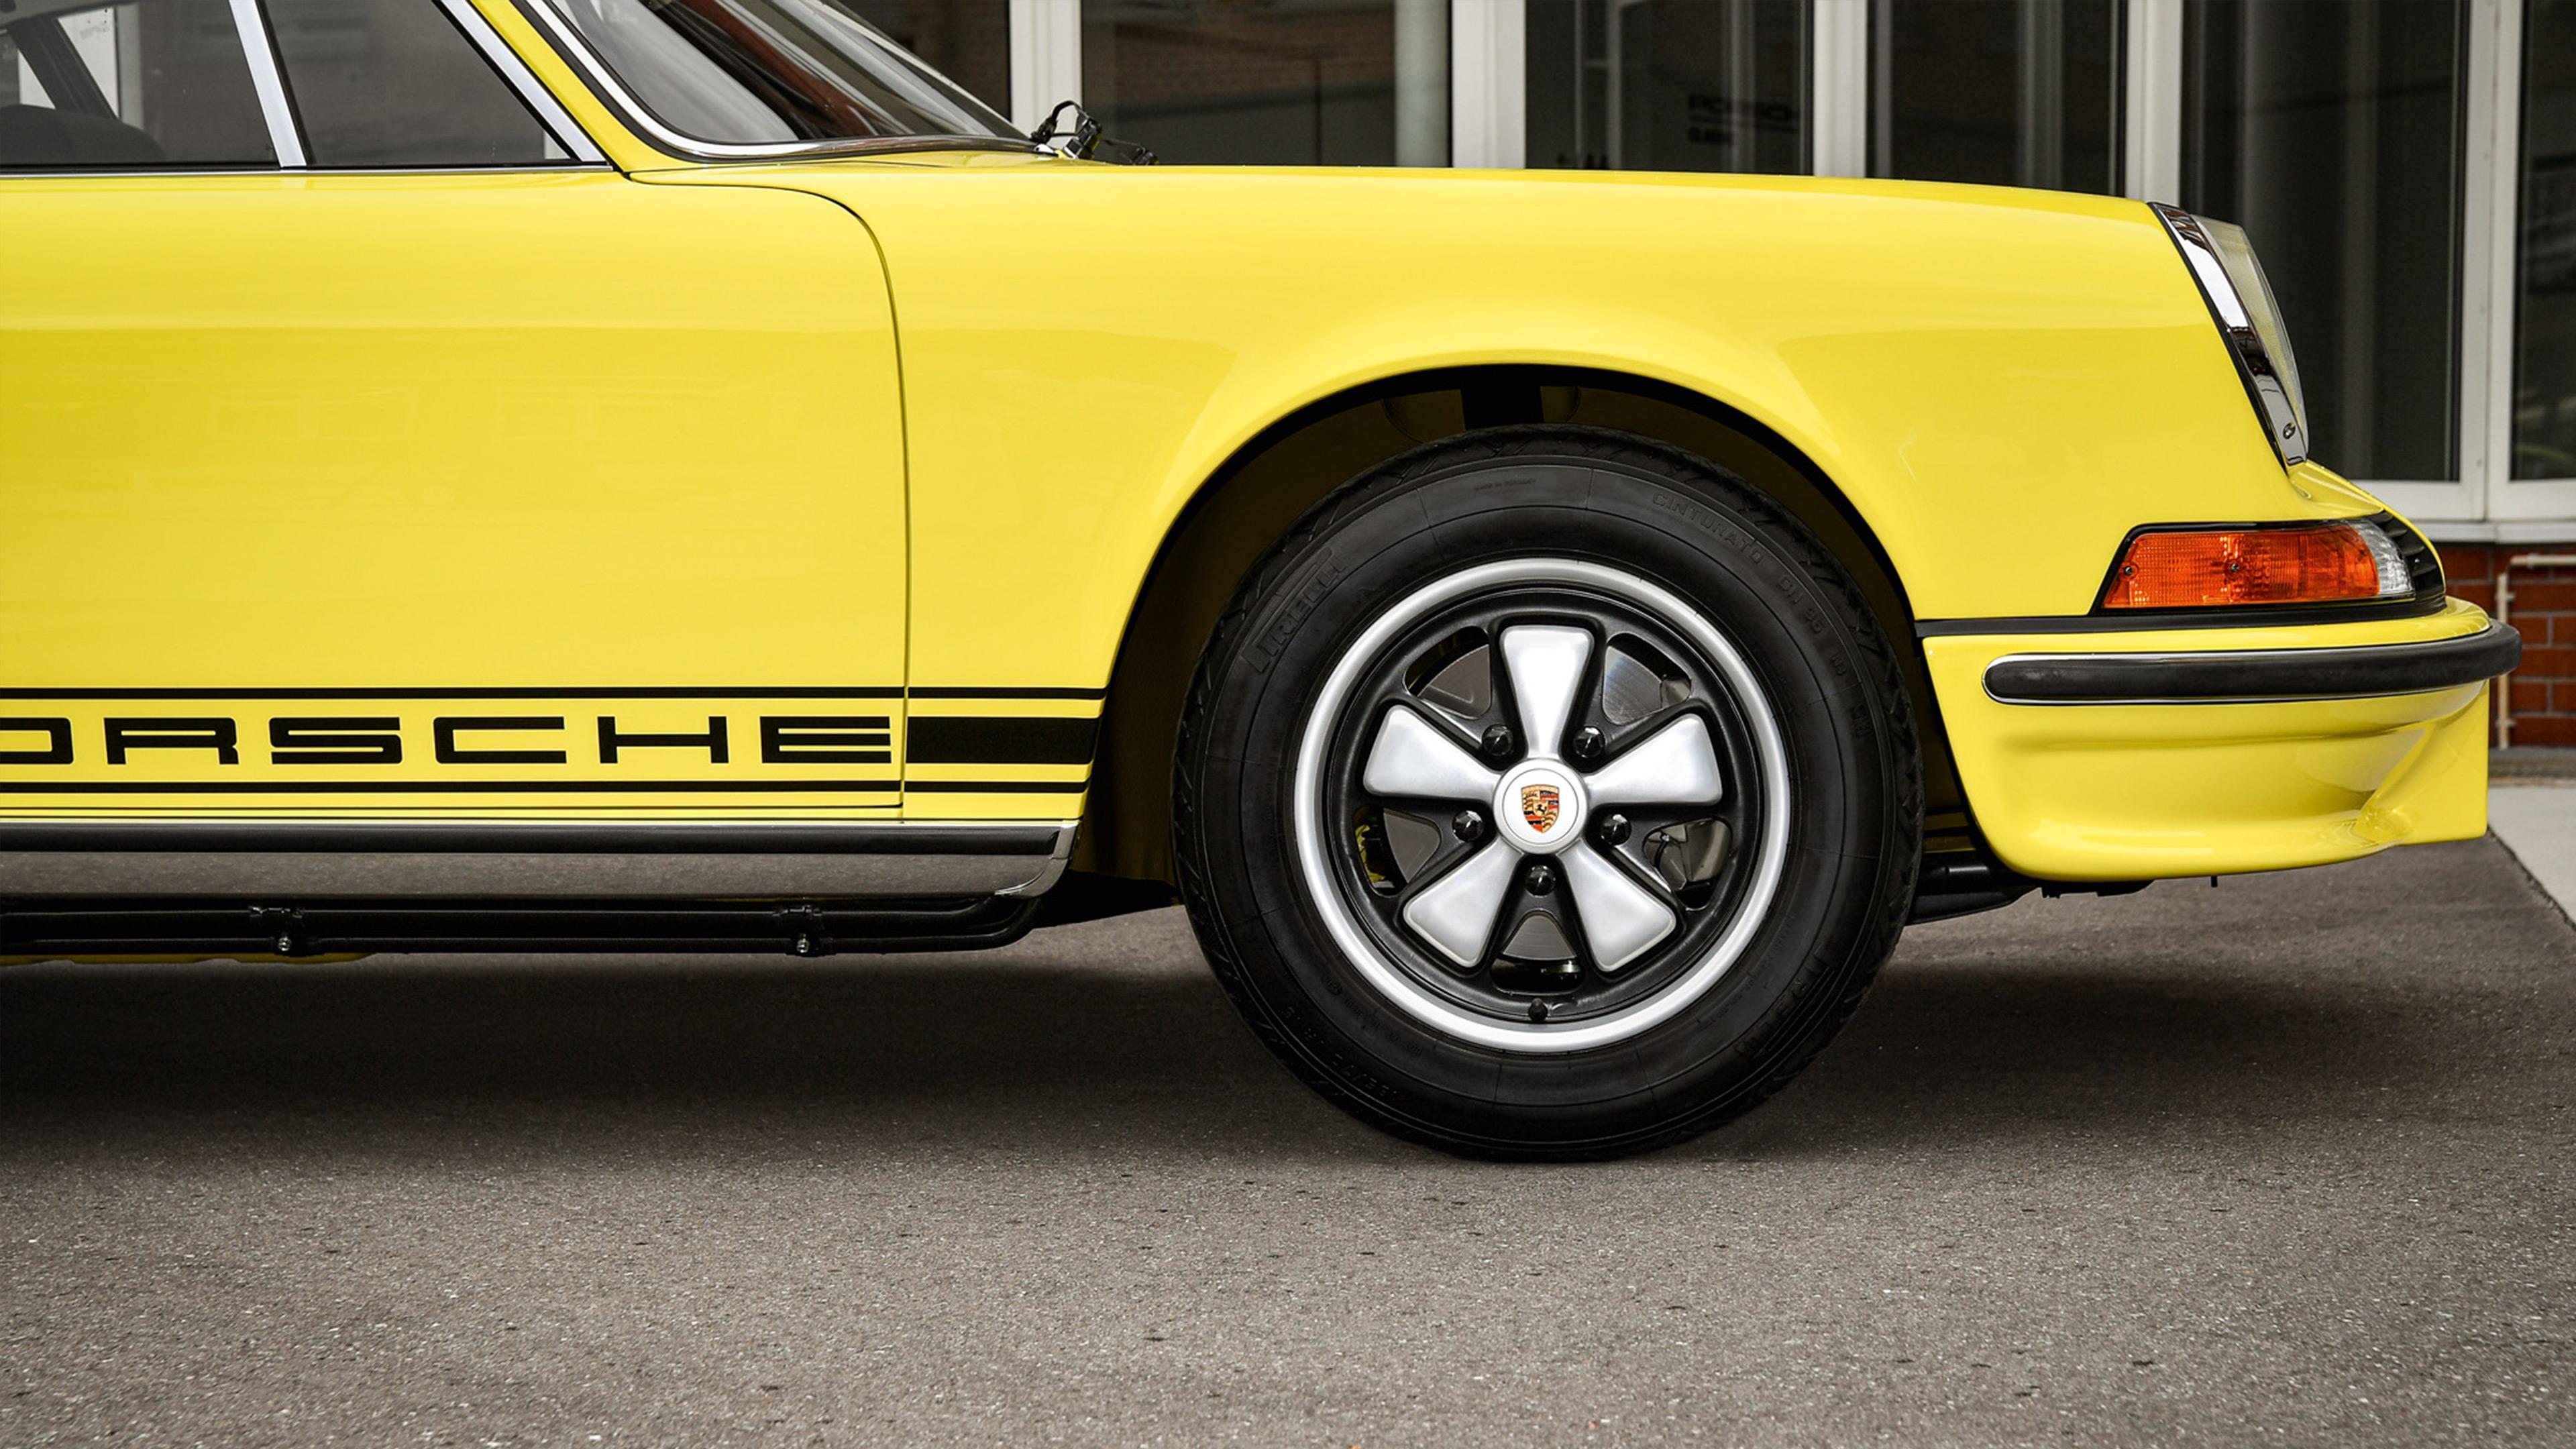 Information About Your Classic Porsche Porsche Classic Porsche Usa